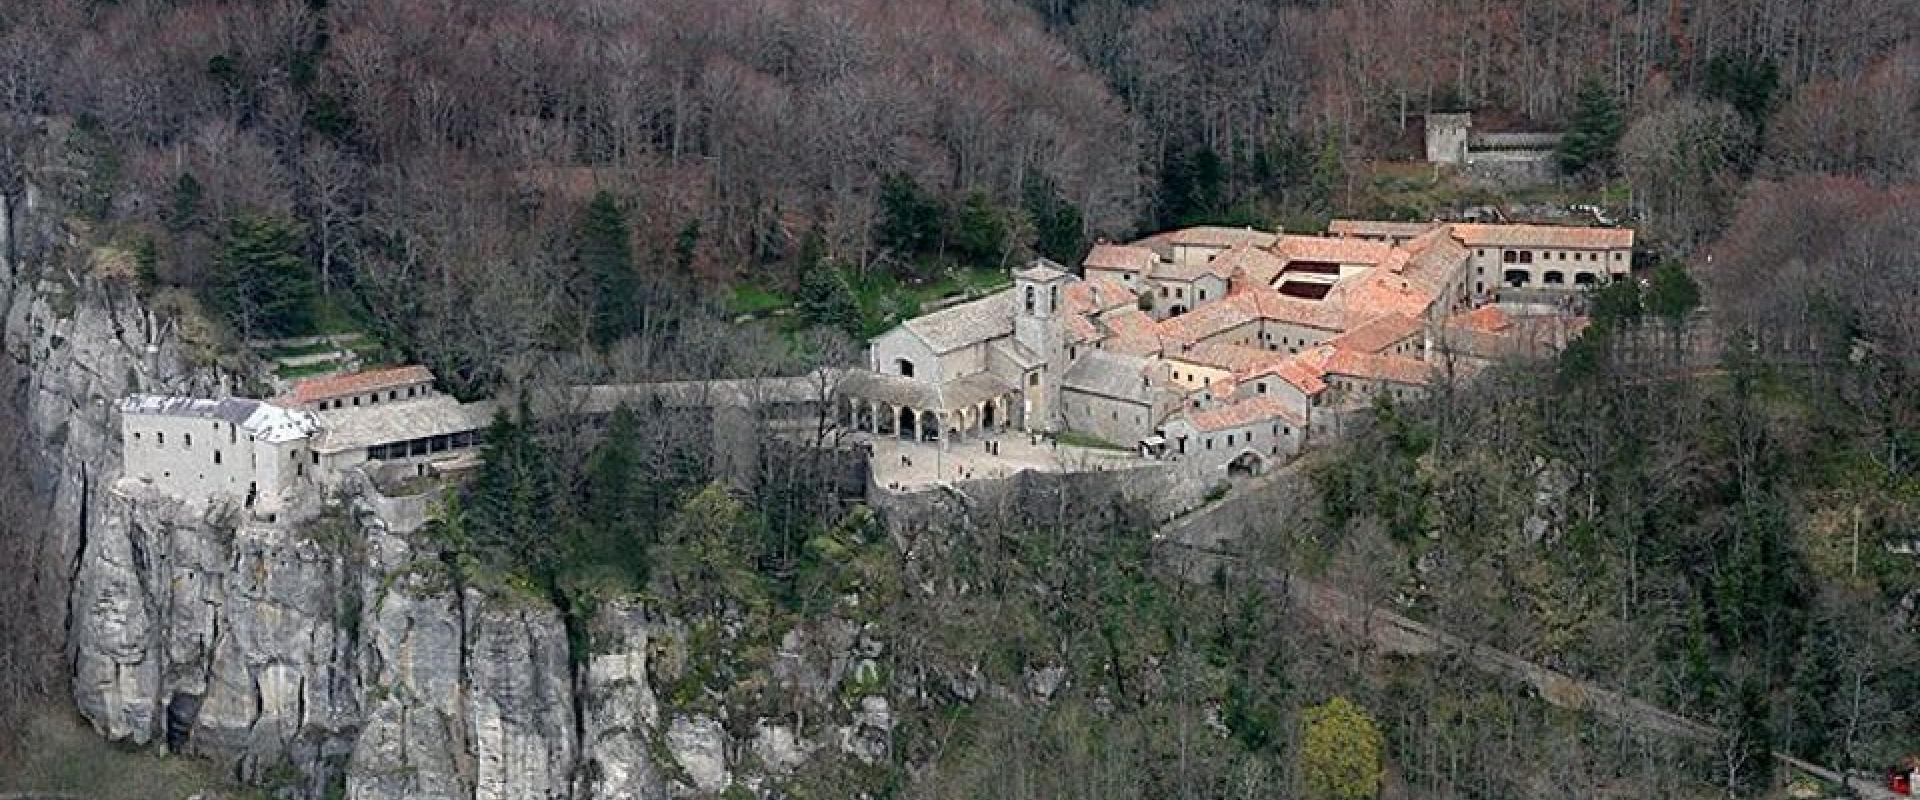 Sanctaury of La Verna